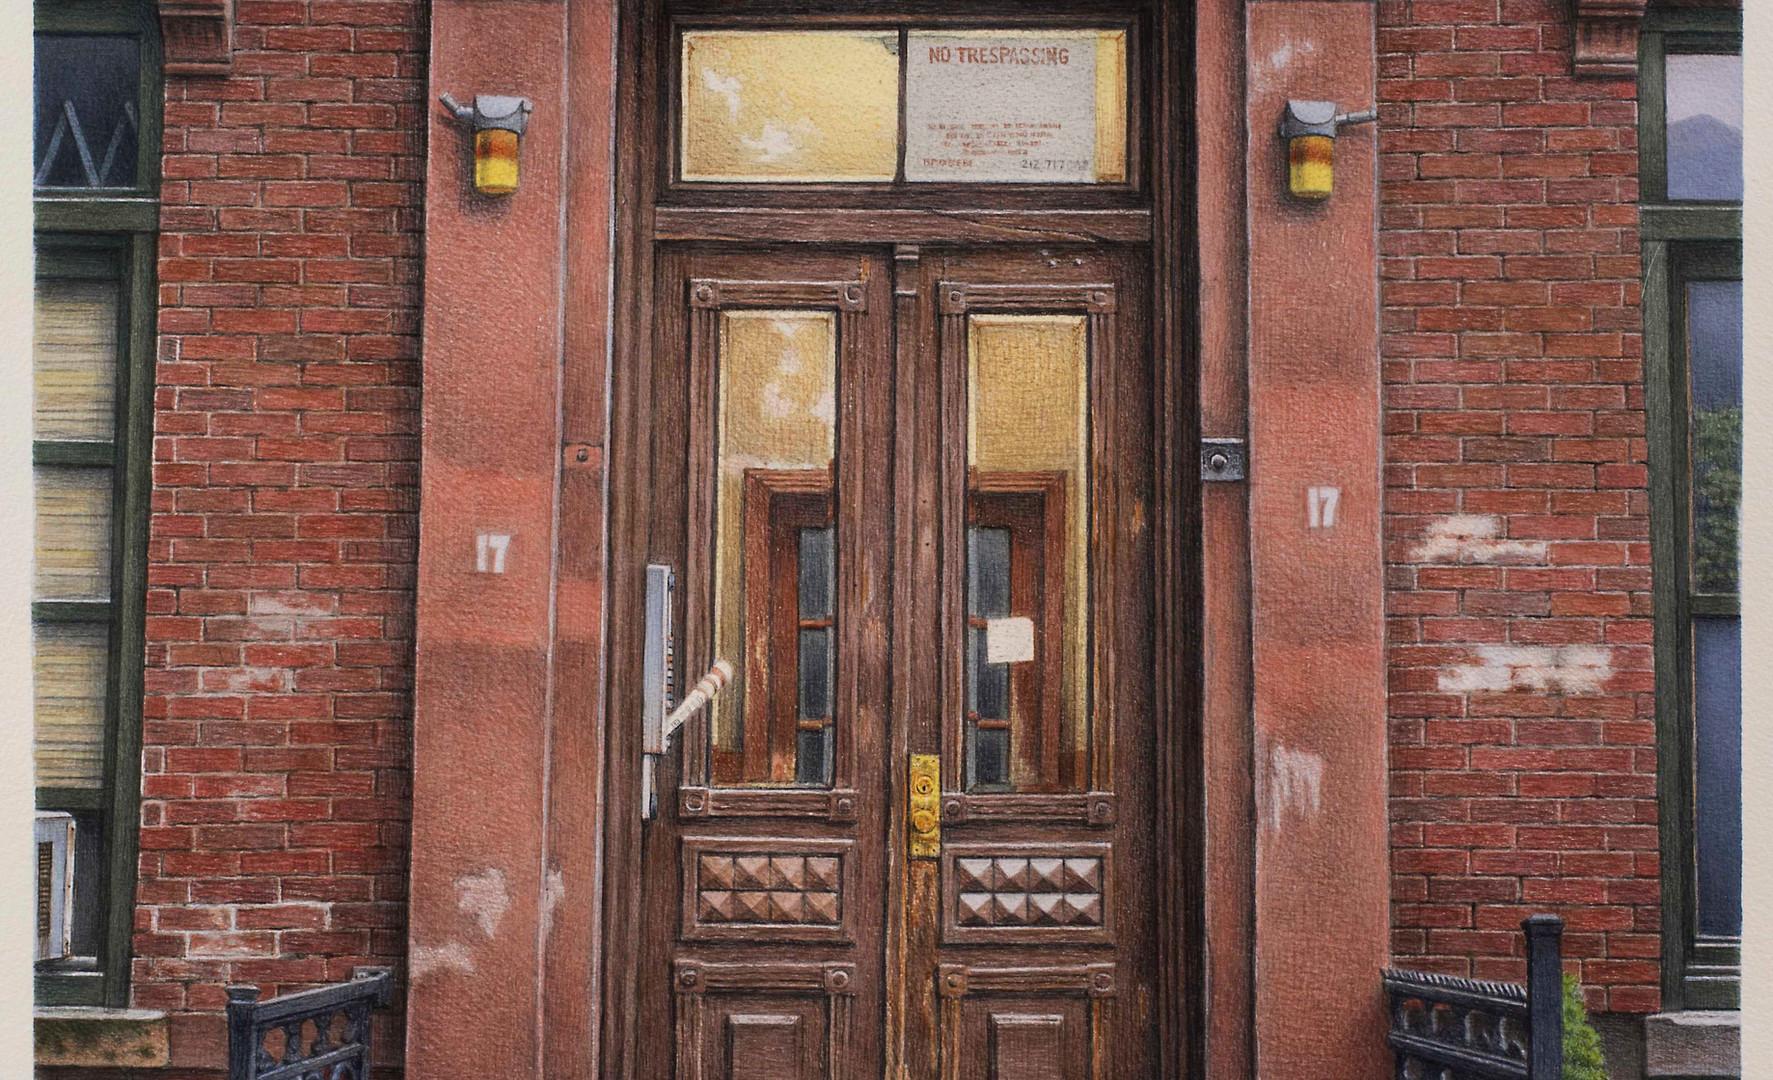 17 Stuyvesant Street, 2018